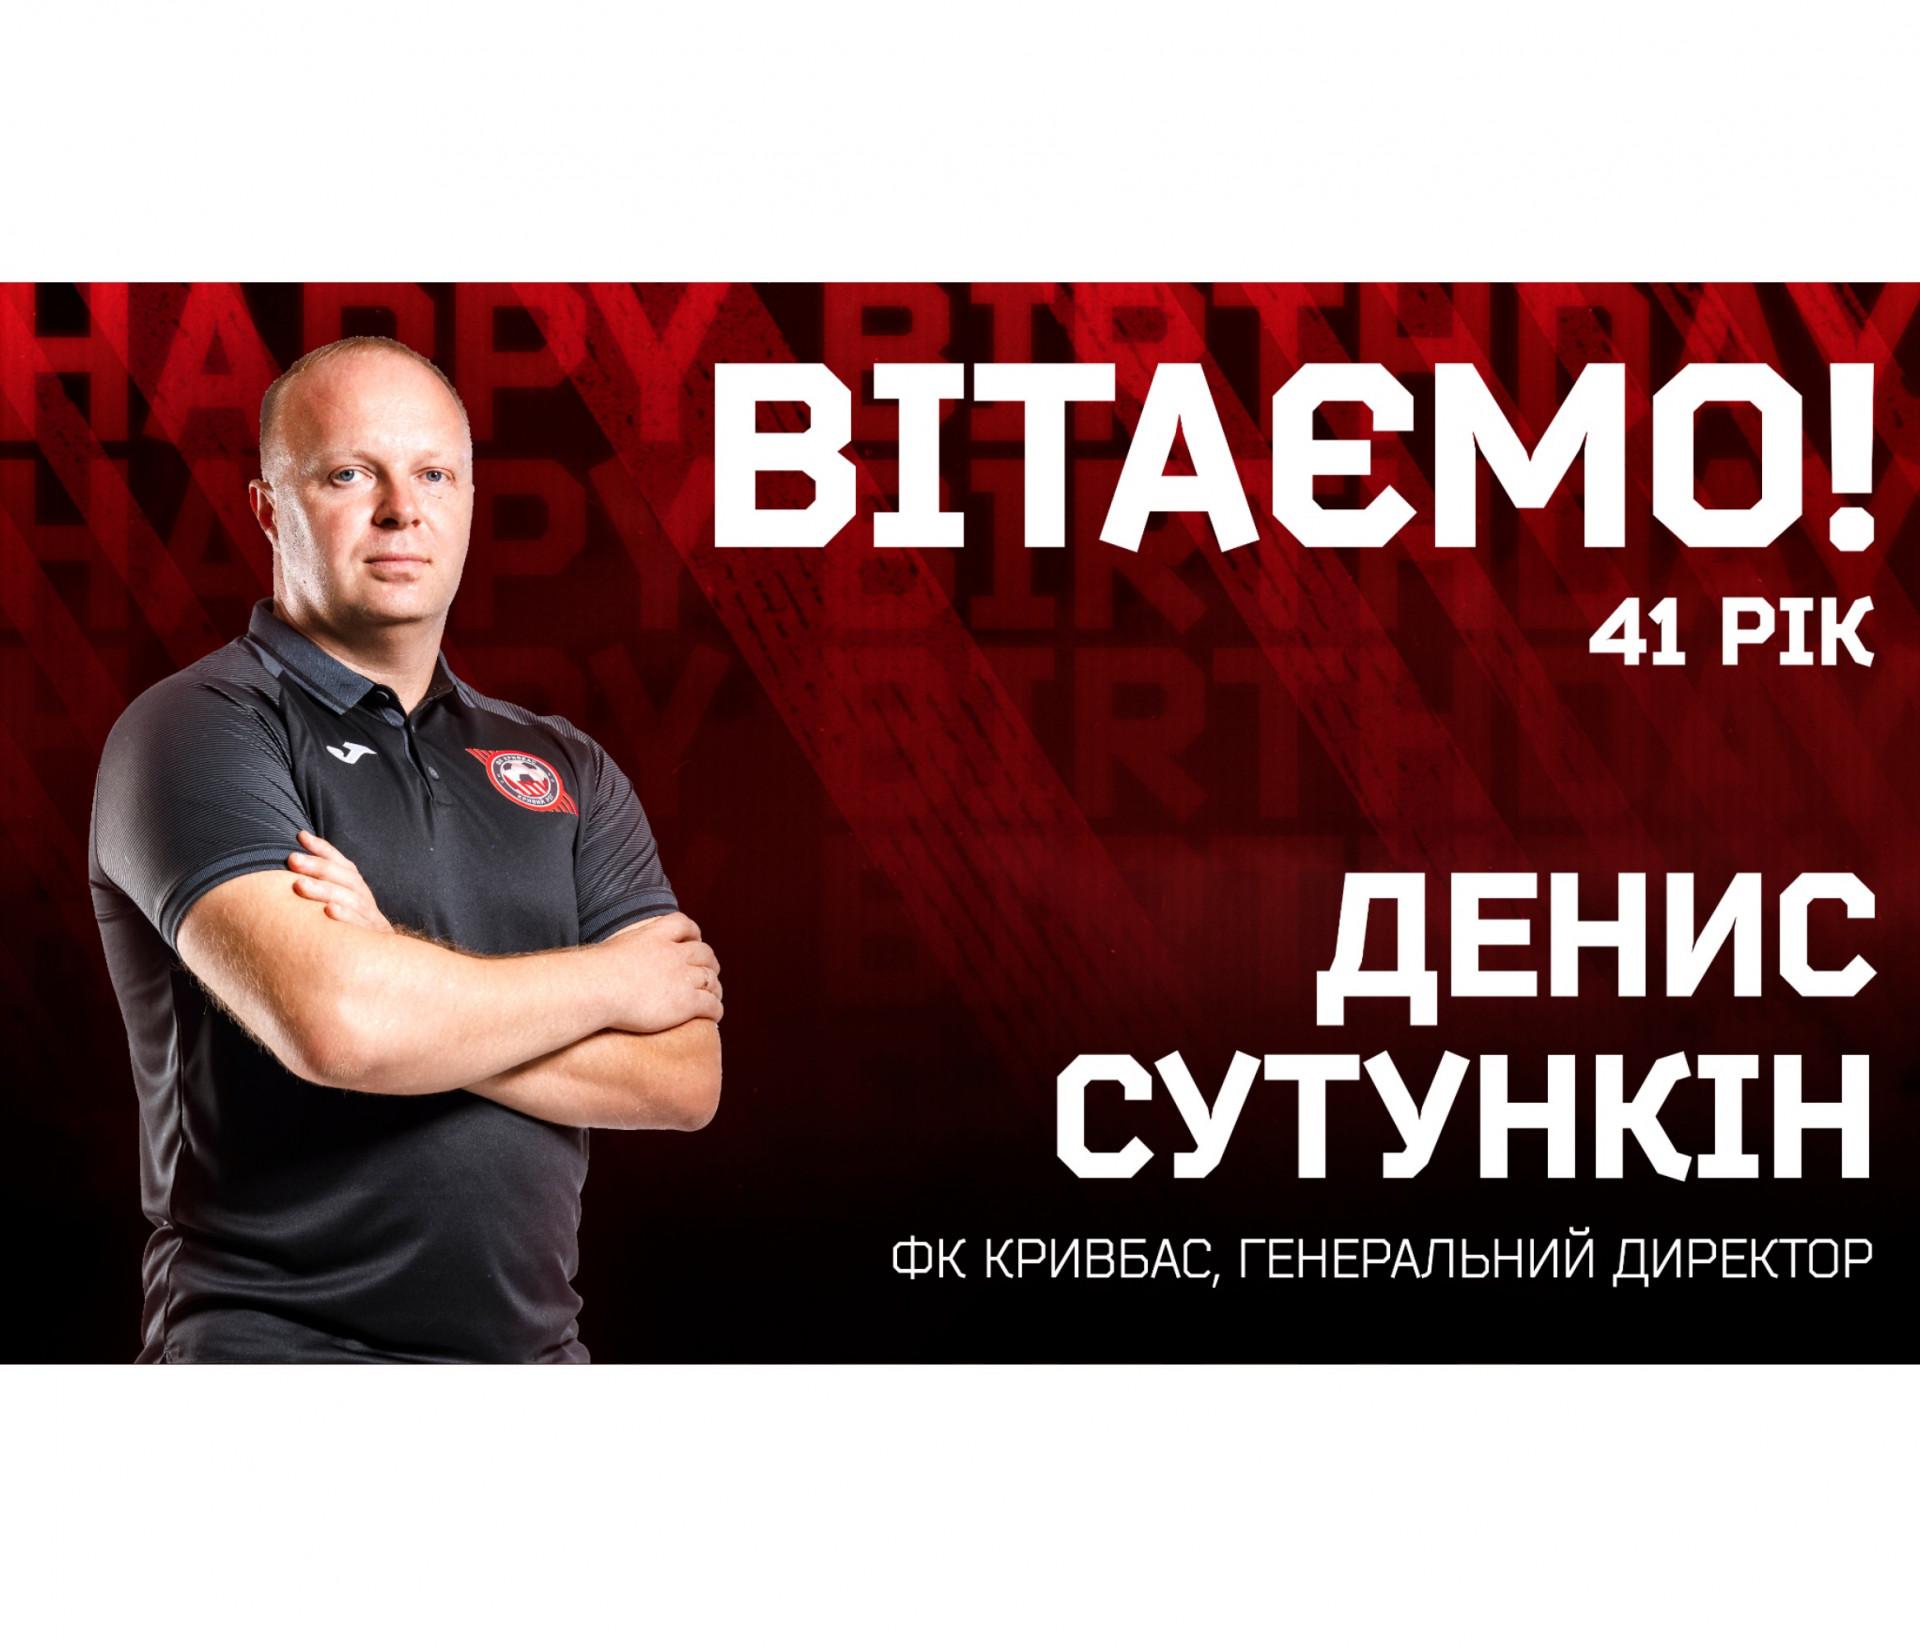 Денису Сутункіну - 41!}